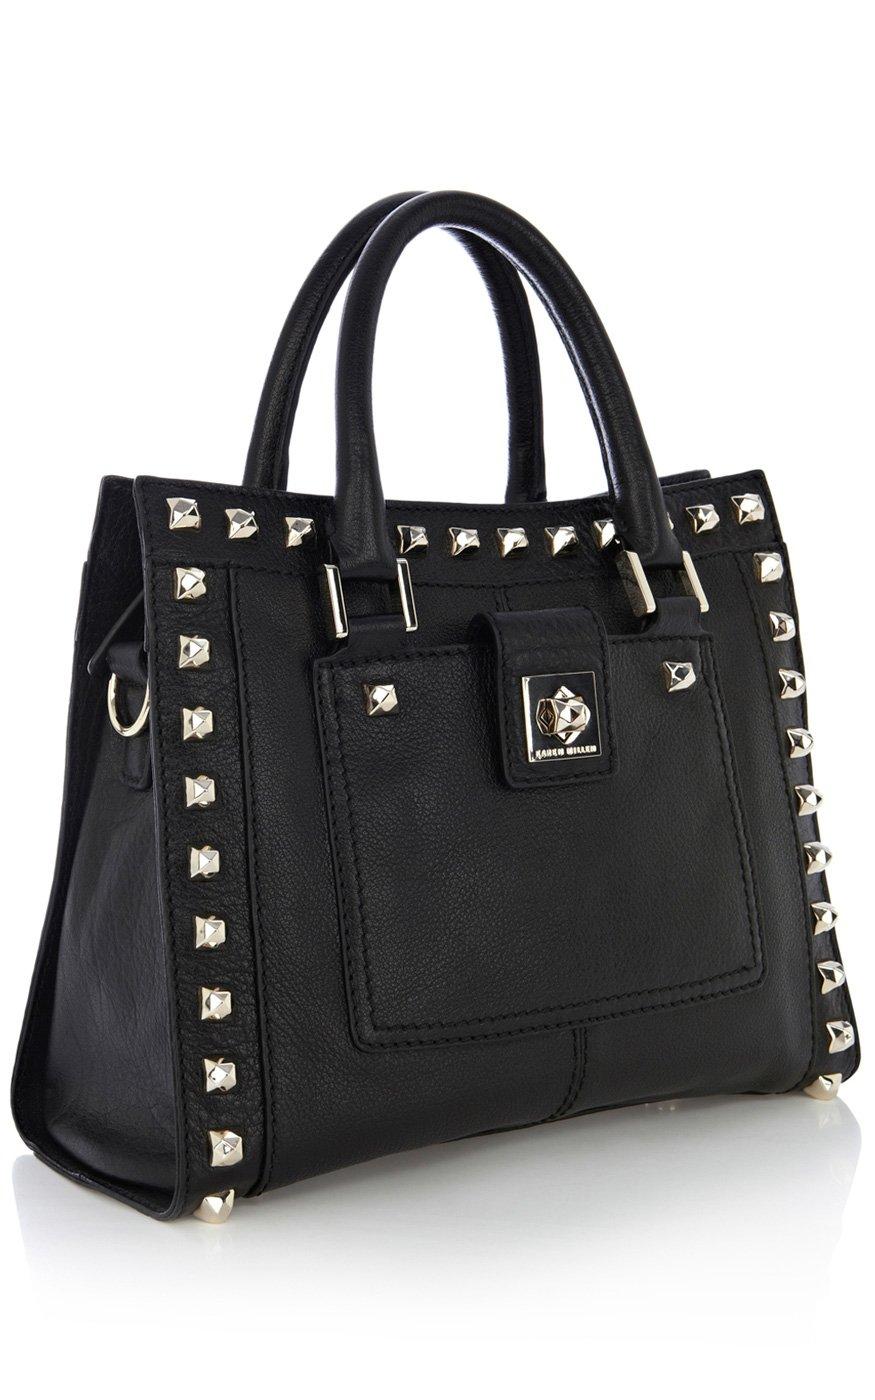 6f0720b240 Lyst - Karen Millen Studded Leather Box Bag in Black